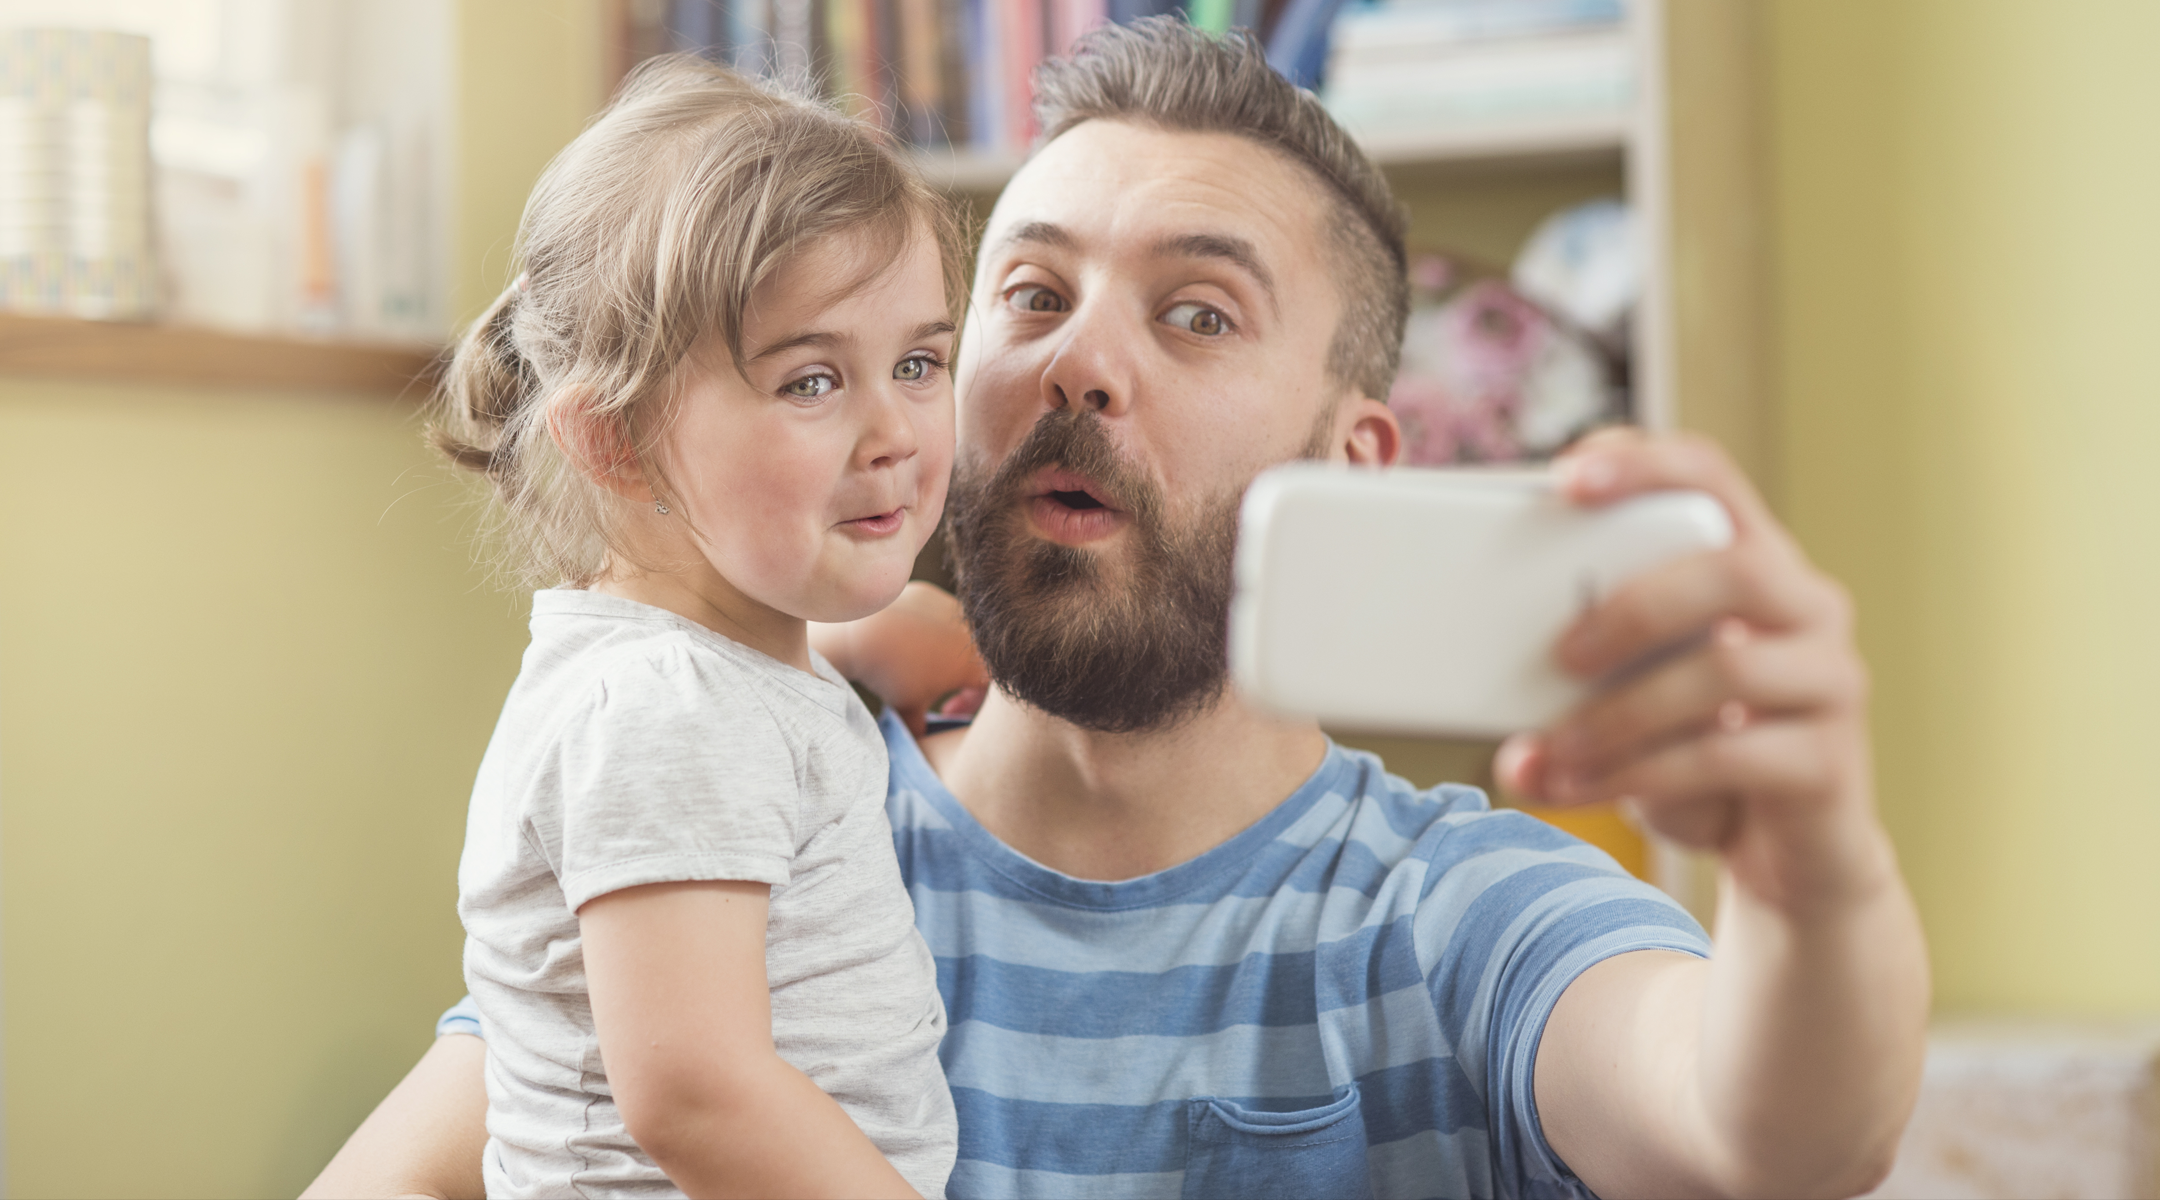 dad-daughter-funny-selfie